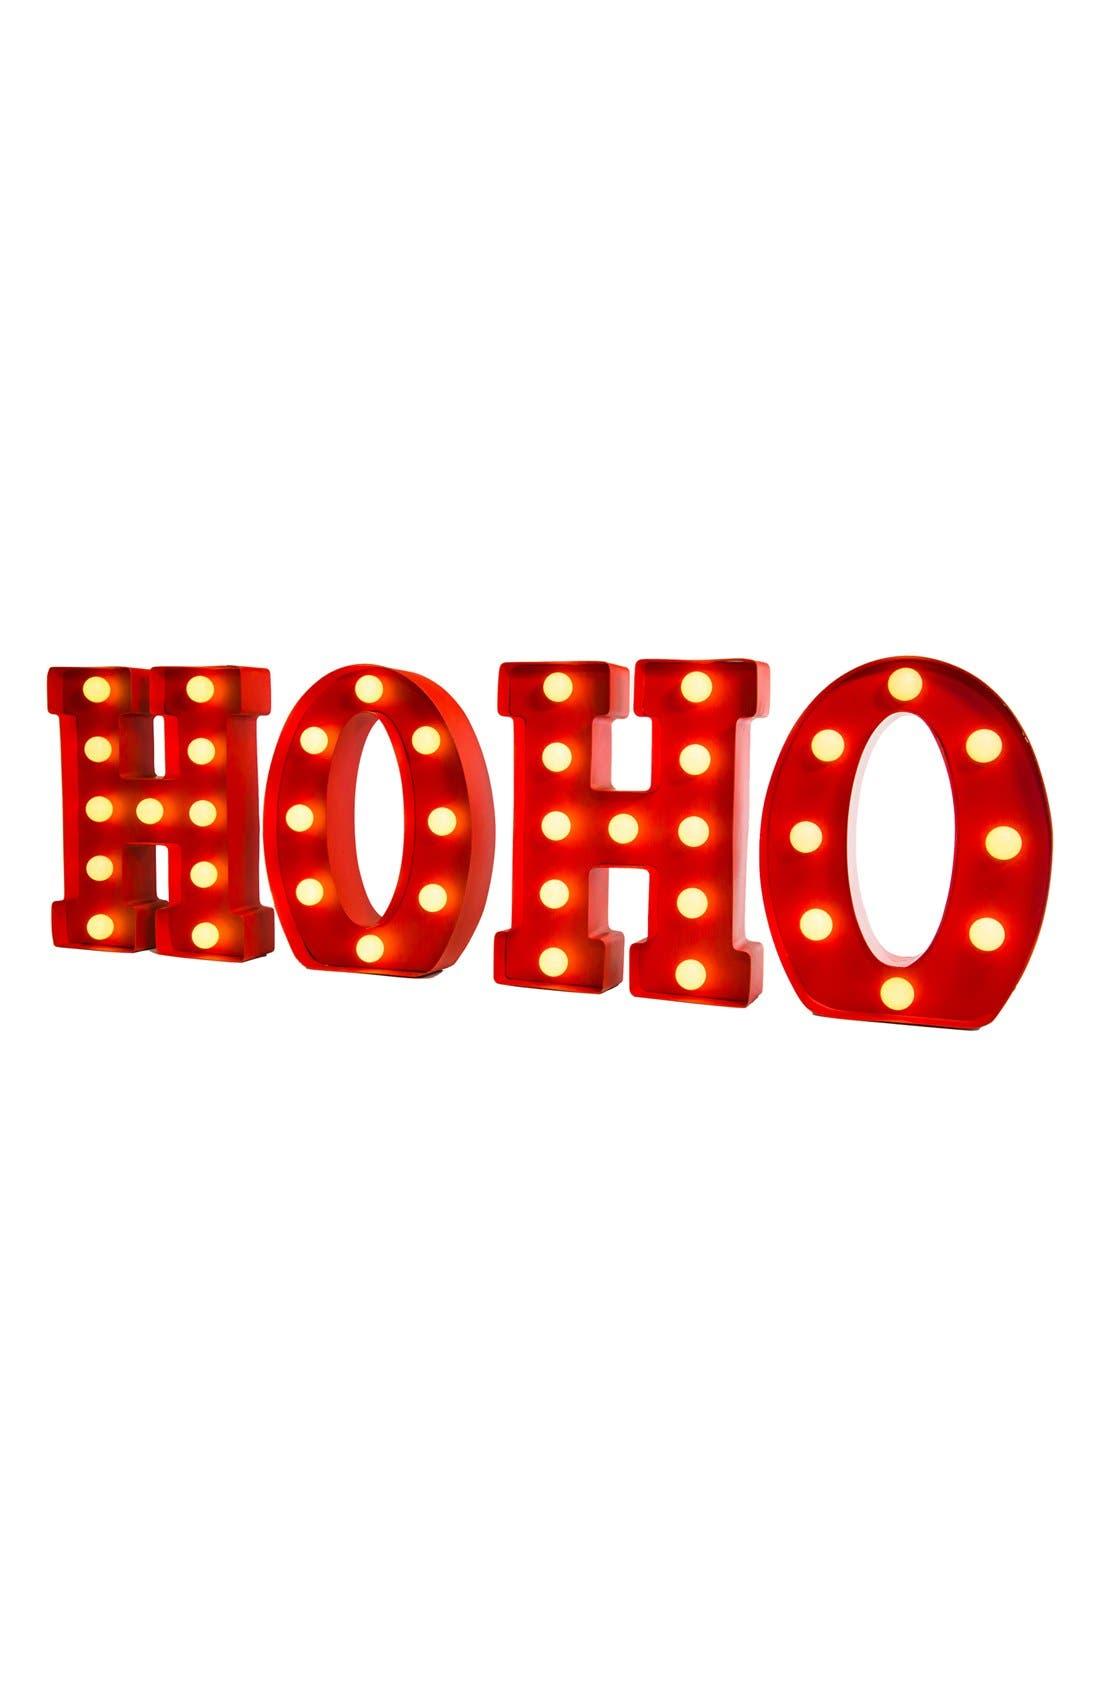 Alternate Image 1 Selected - Mr. Christmas Light Up 'Ho Ho' Marquee